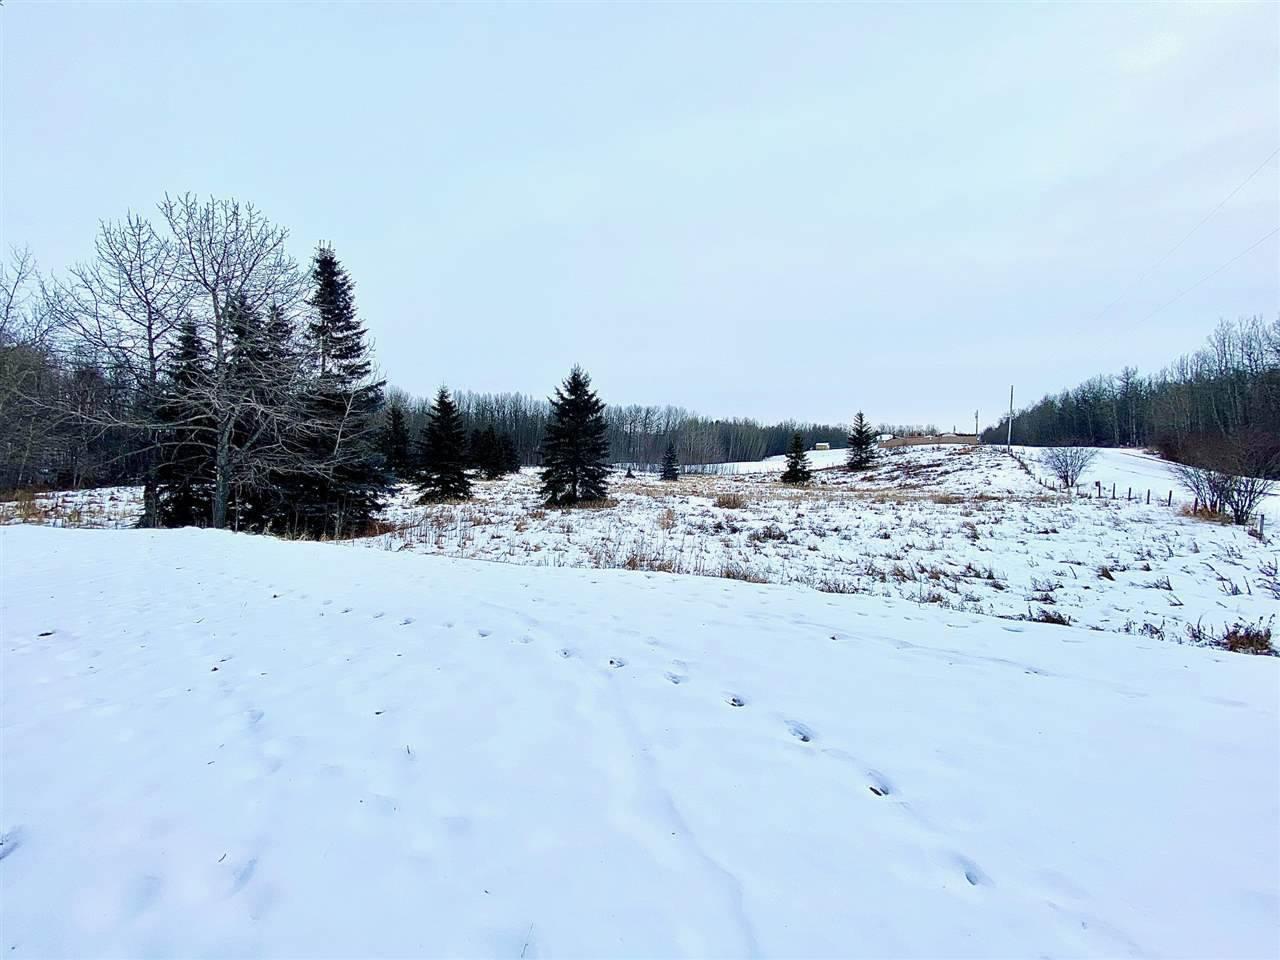 Main Photo: 54325 RGE RD 280: Rural Sturgeon County House for sale : MLS®# E4215294